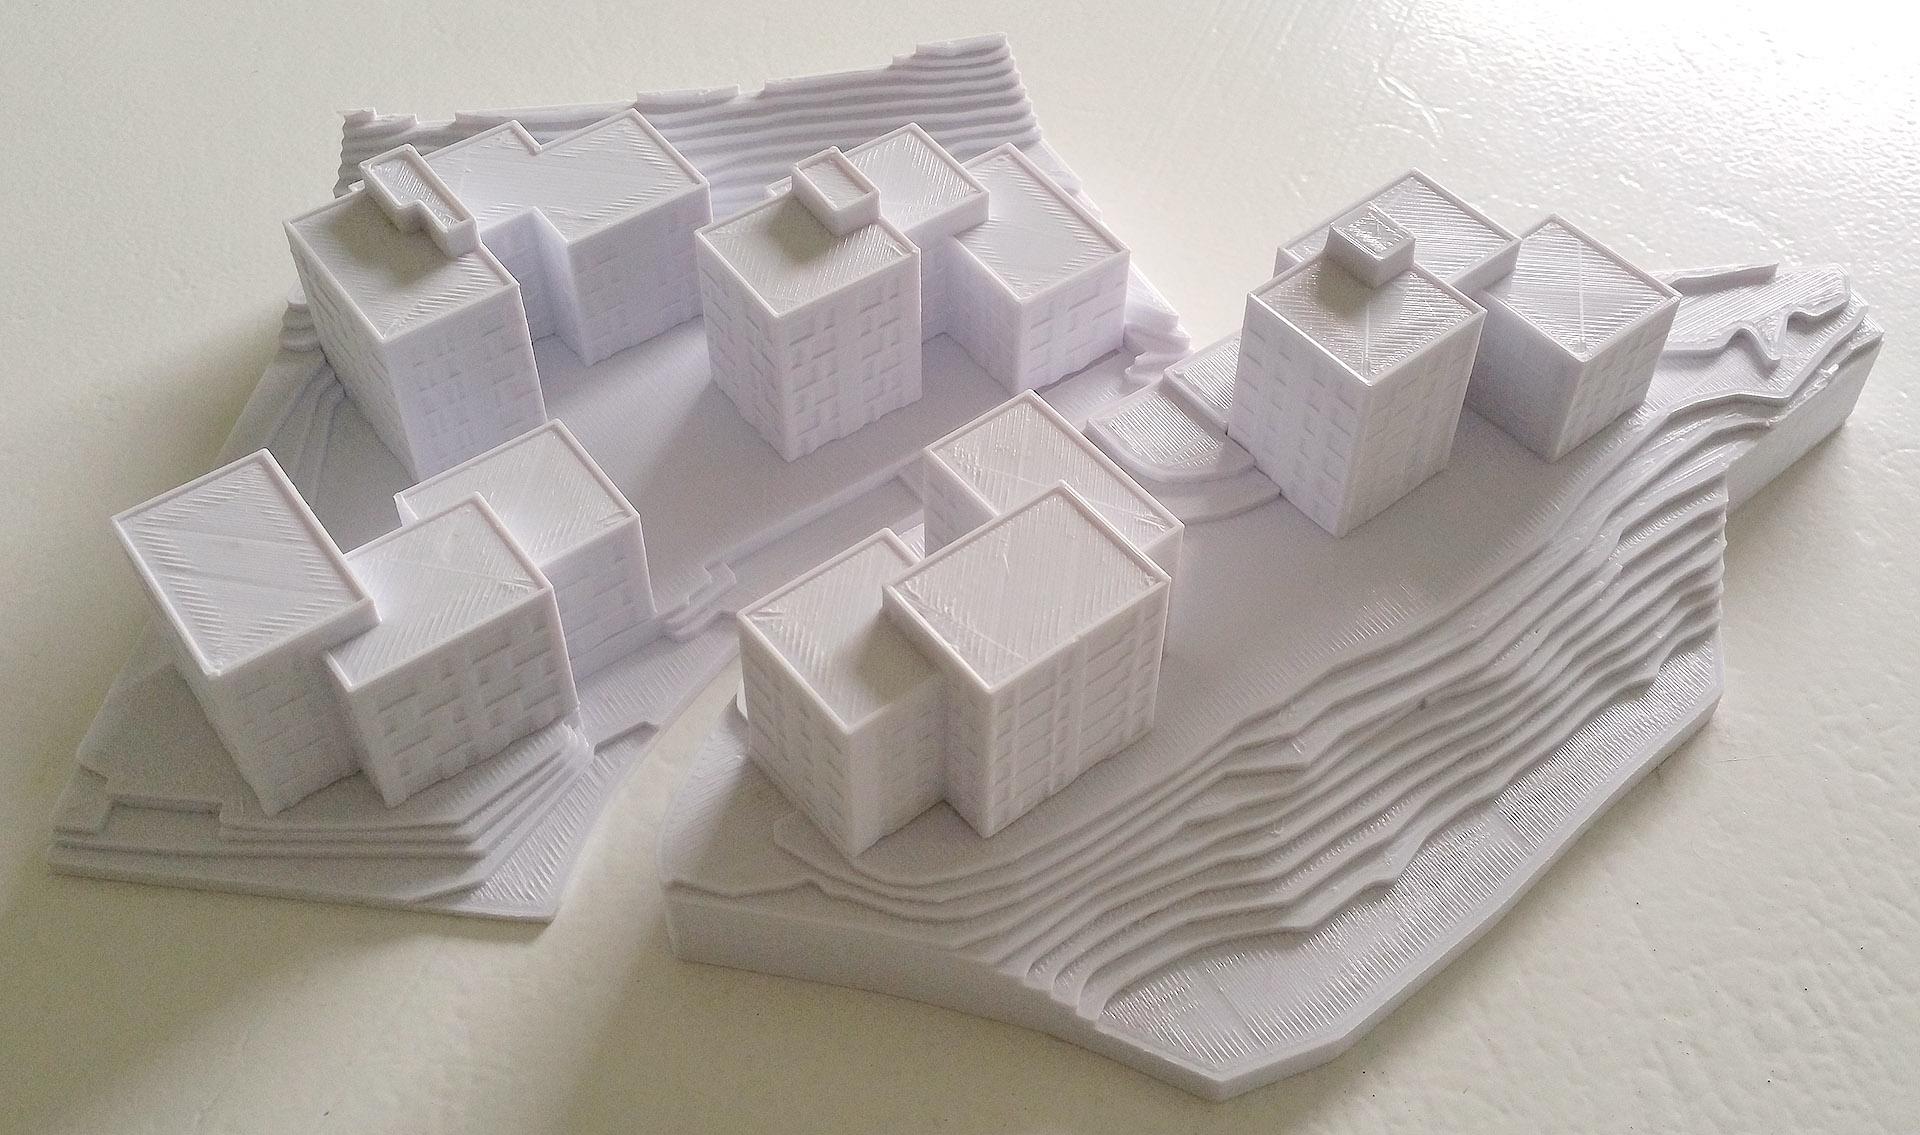 3D Print Buildings